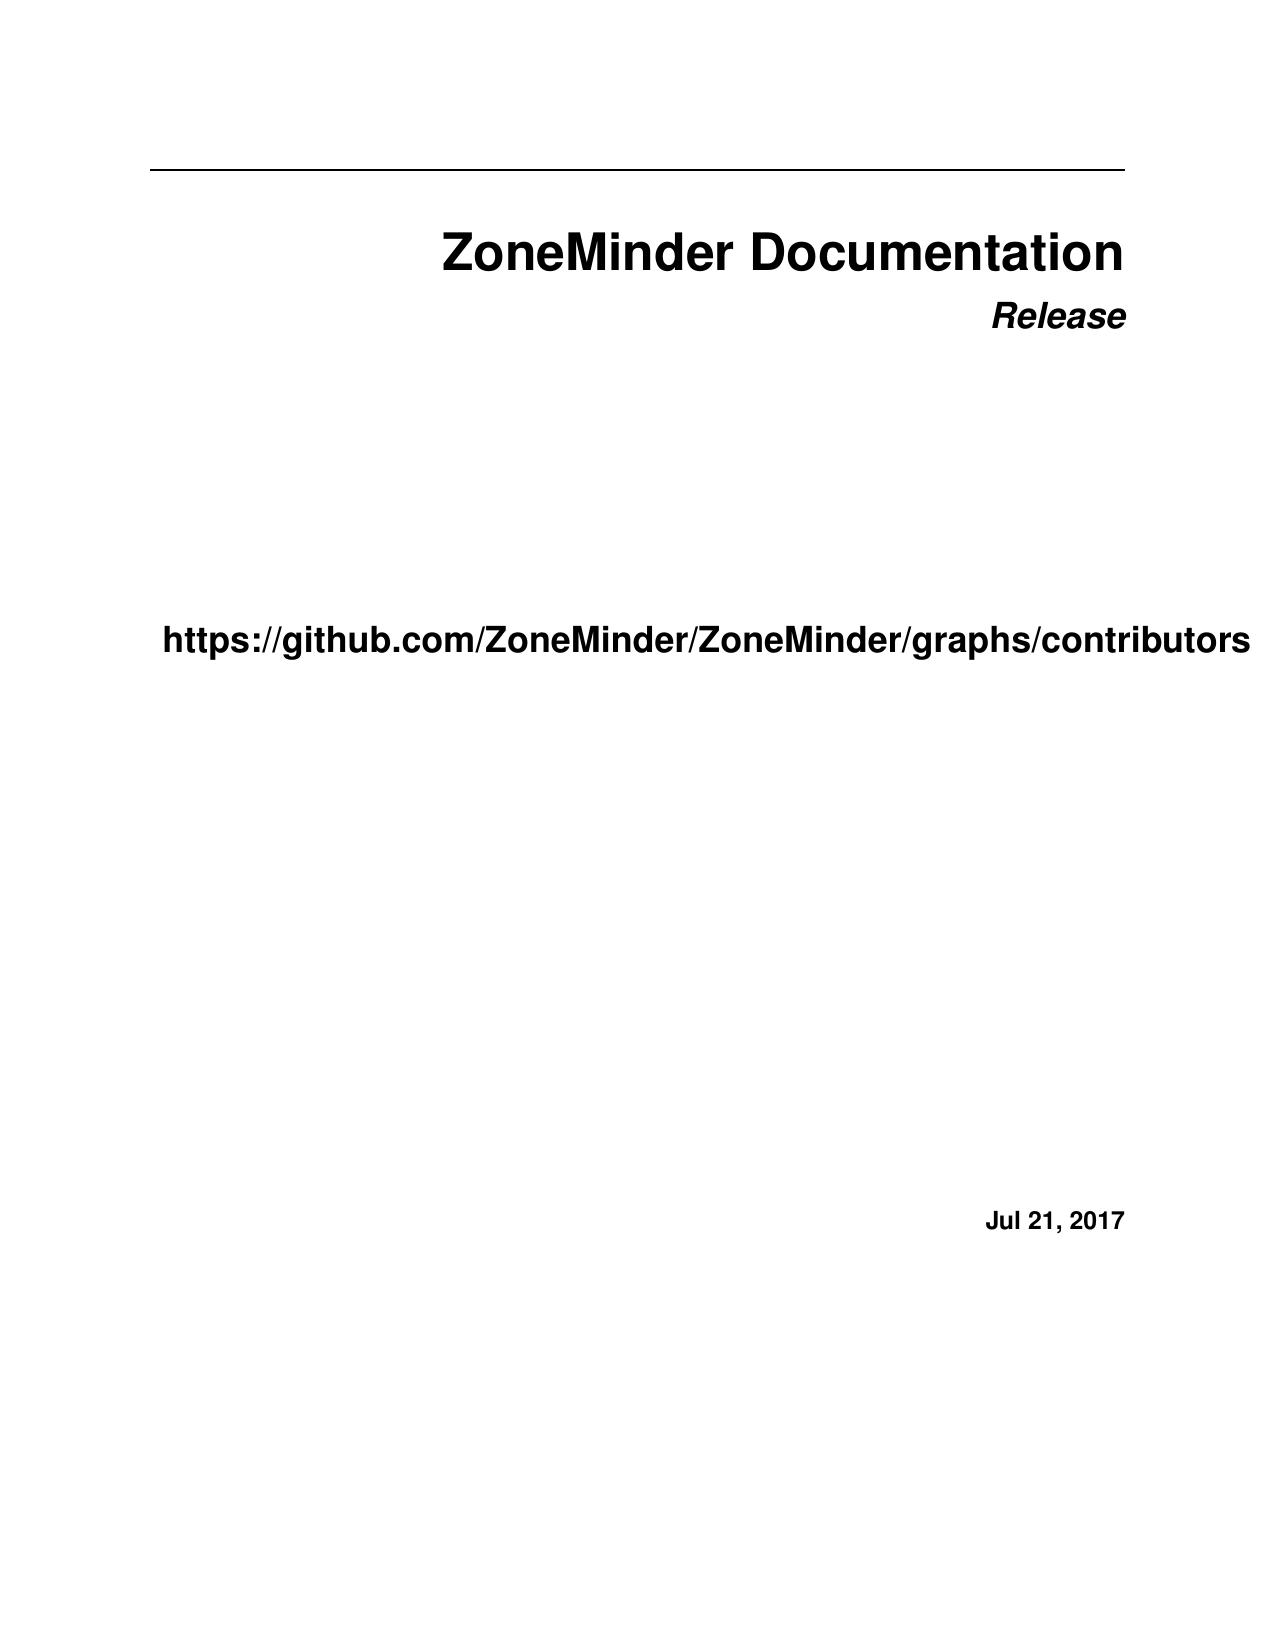 install zoneminder fedora